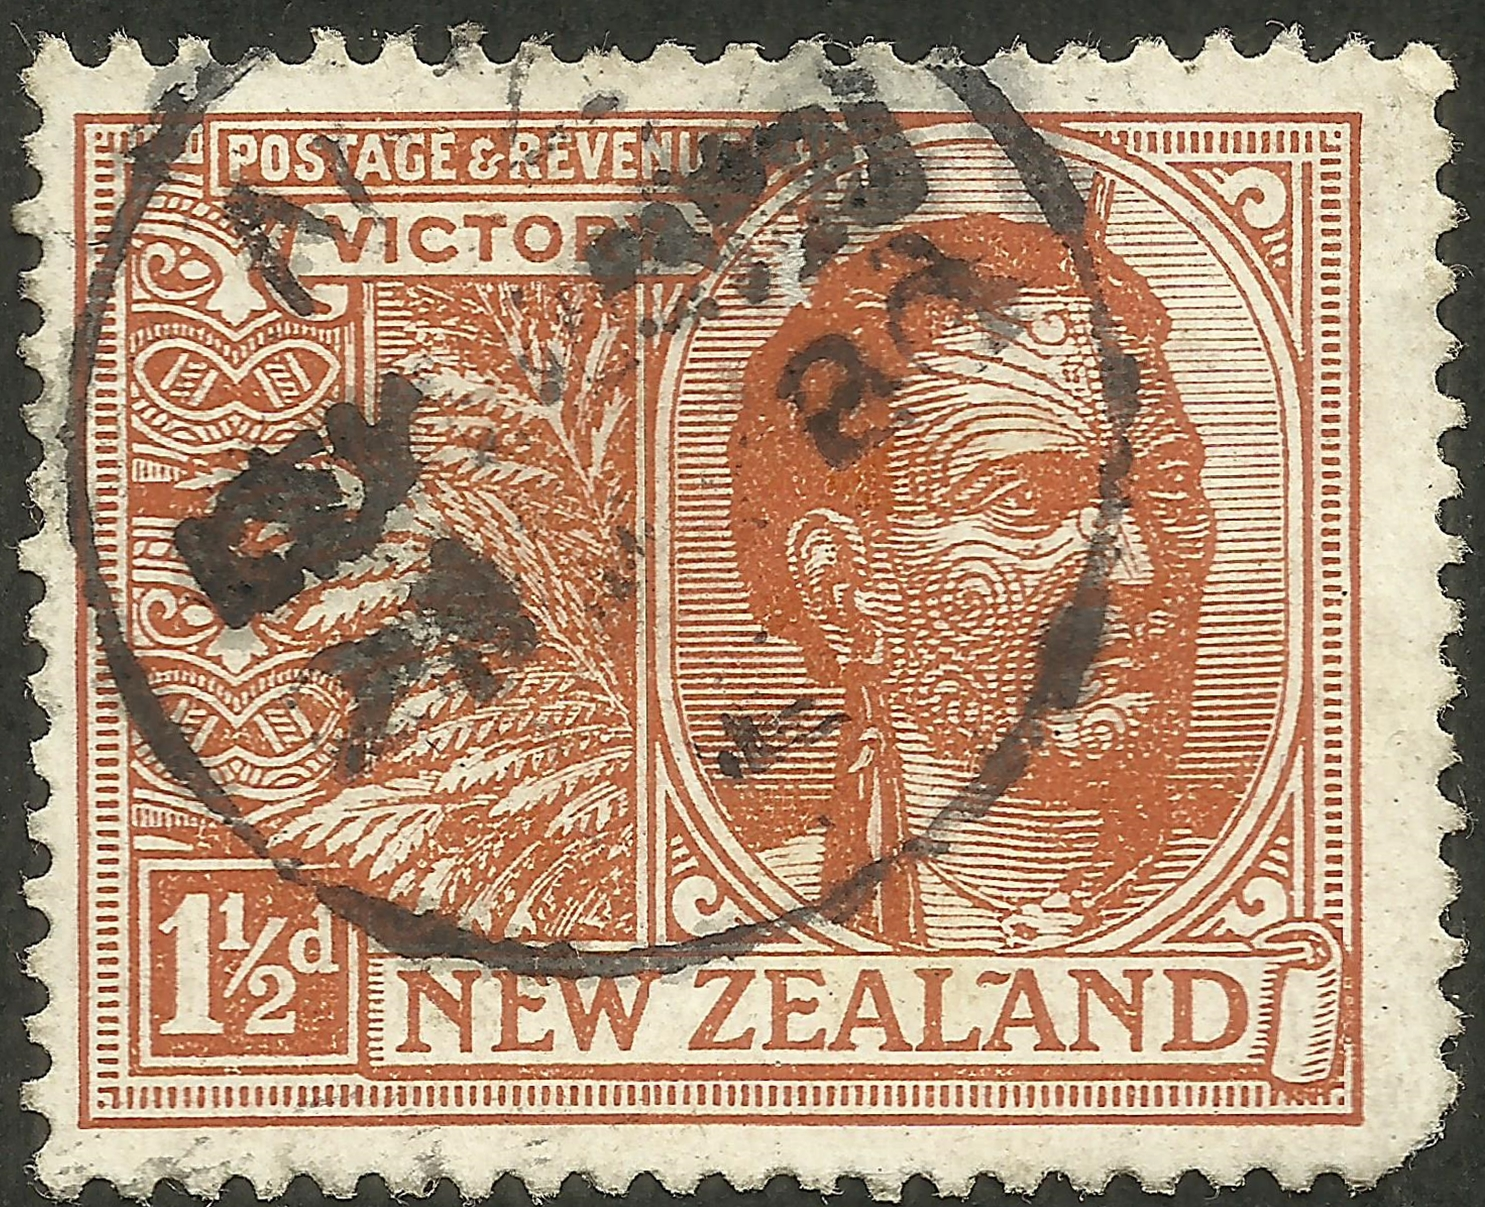 New Zealand - Scott #167 (1920)